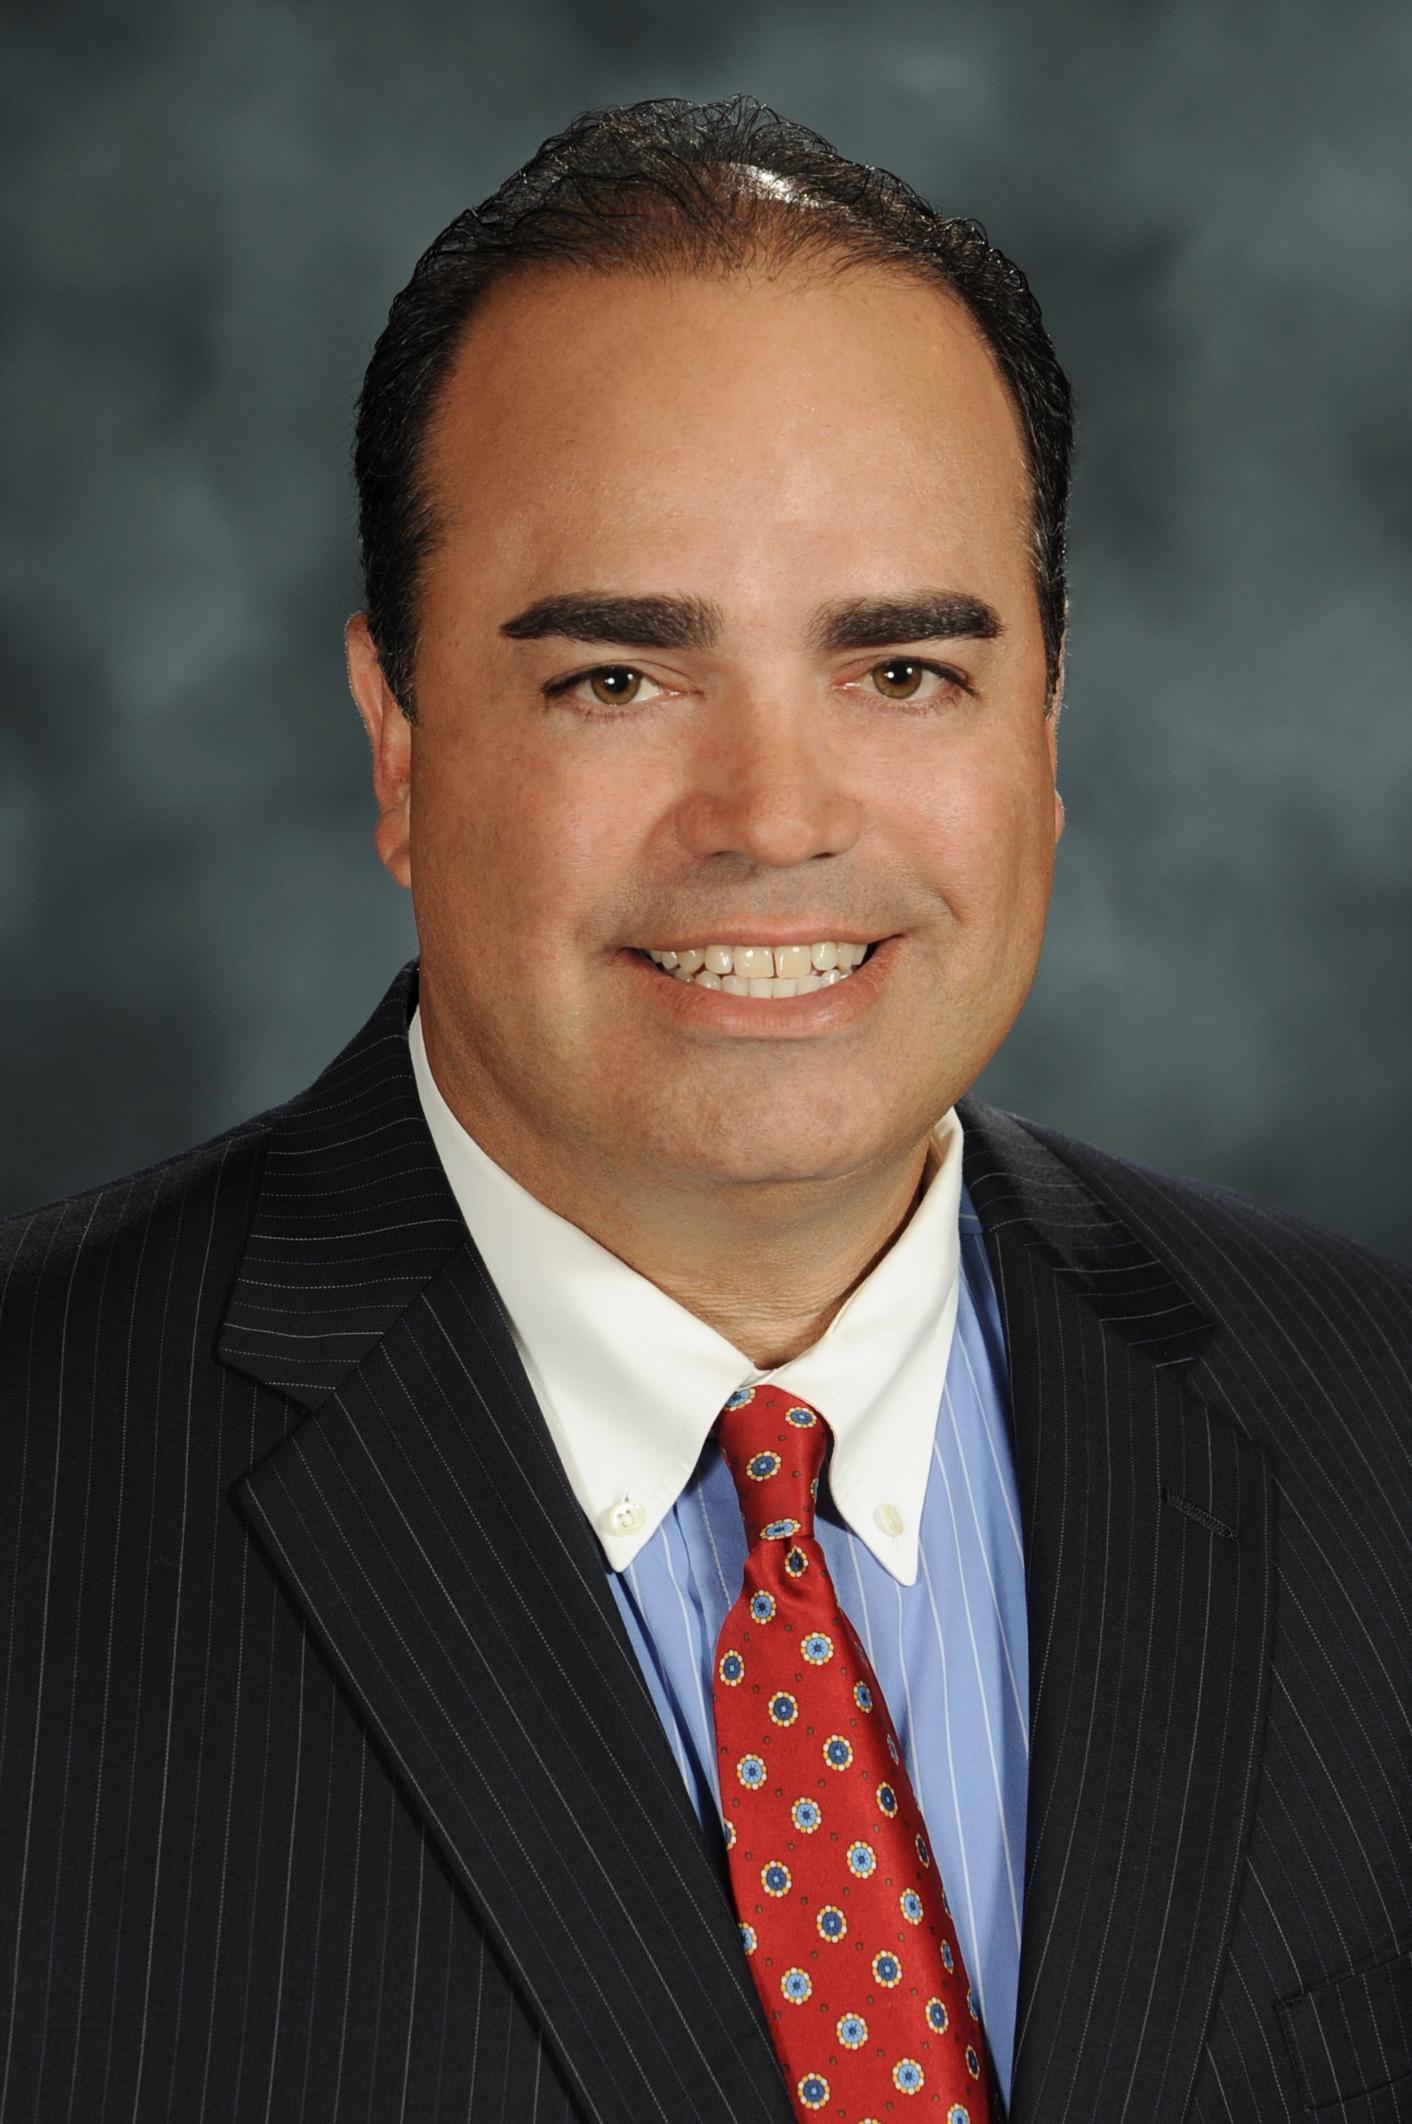 Rodney G. Frias